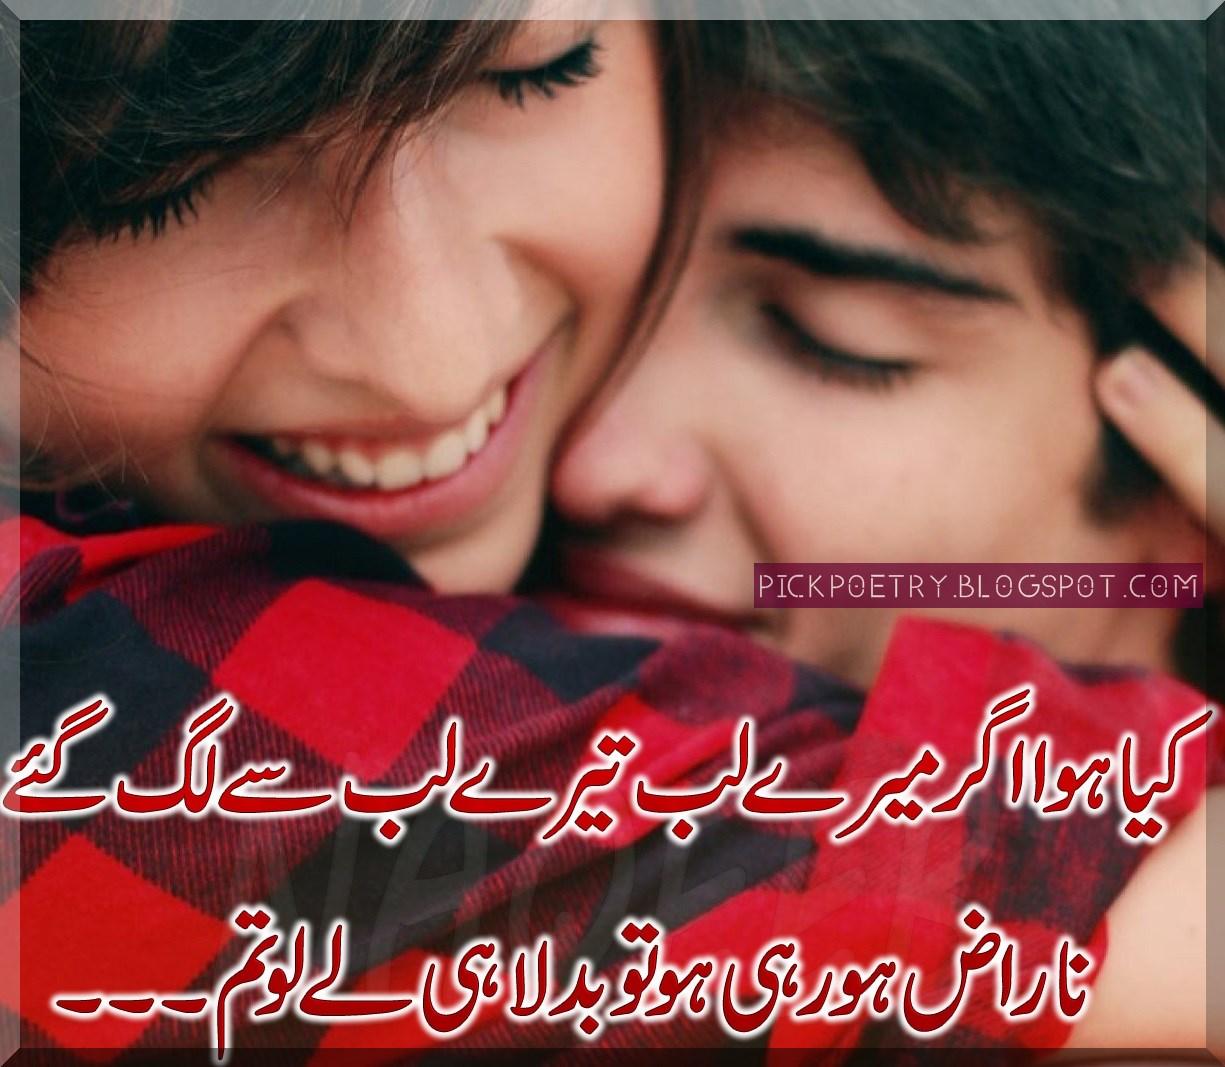 Love Shayari: Love Poetry In Urdu With Romantic Shayari